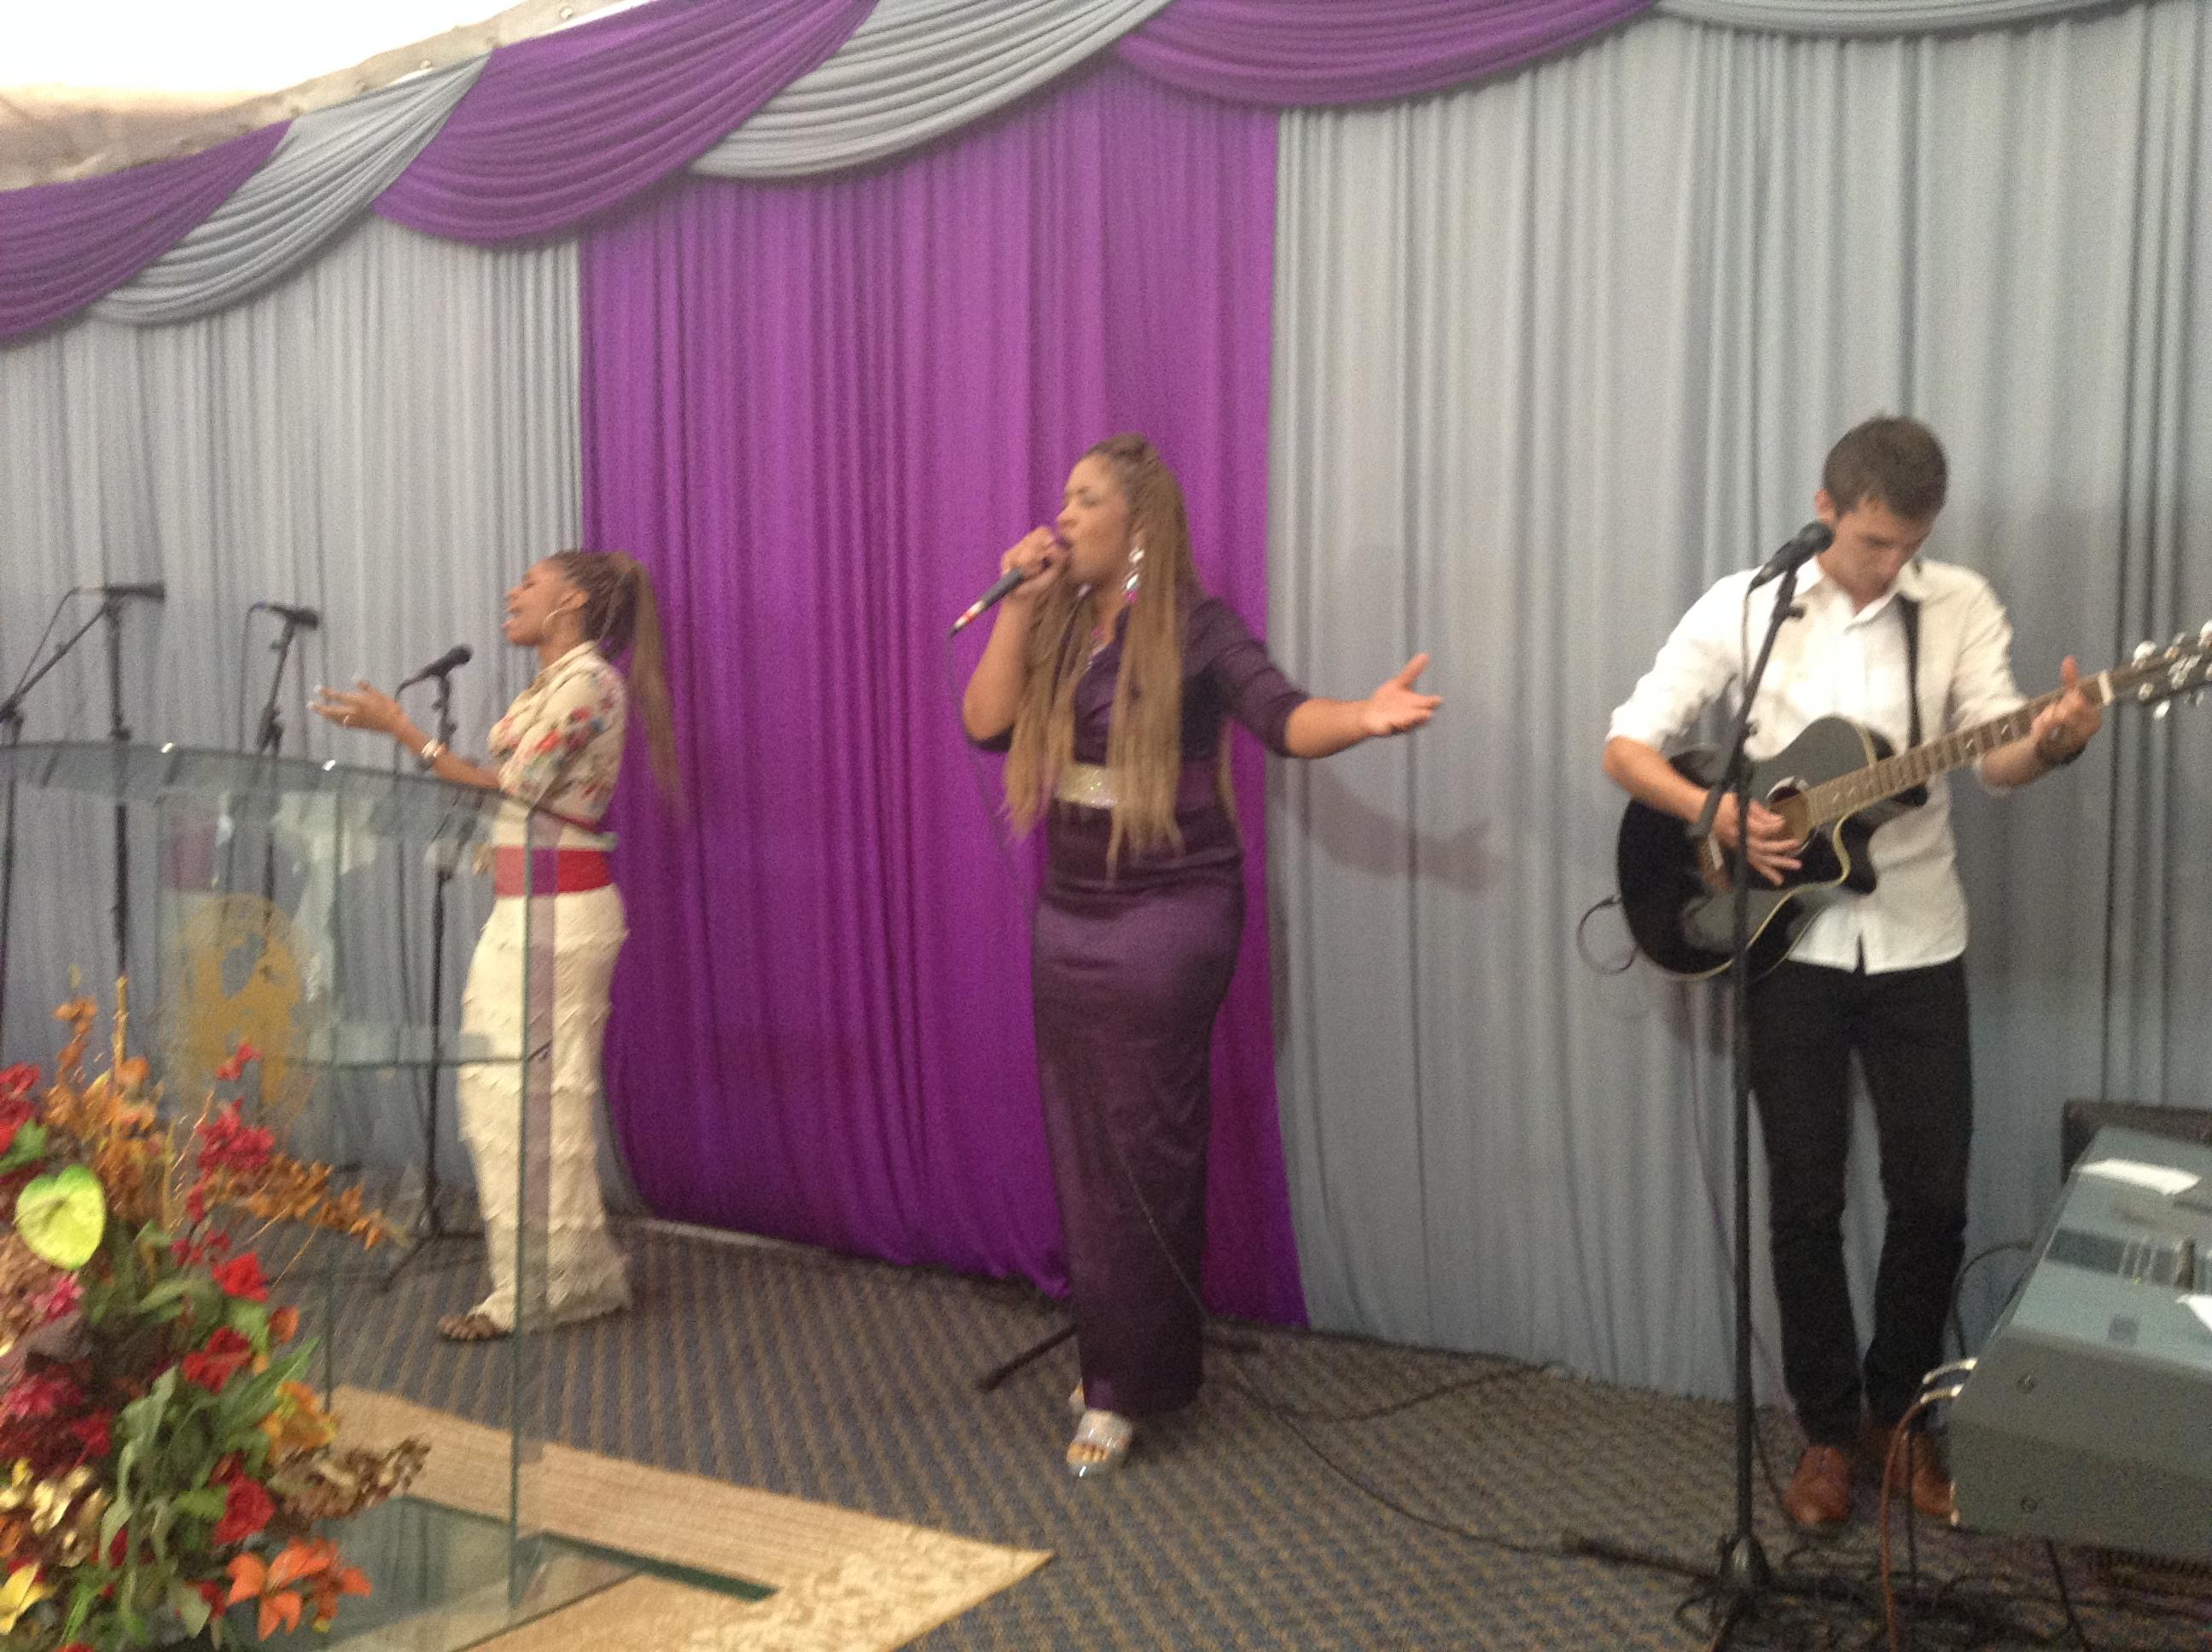 R.O.M.I. Mission Worship Team